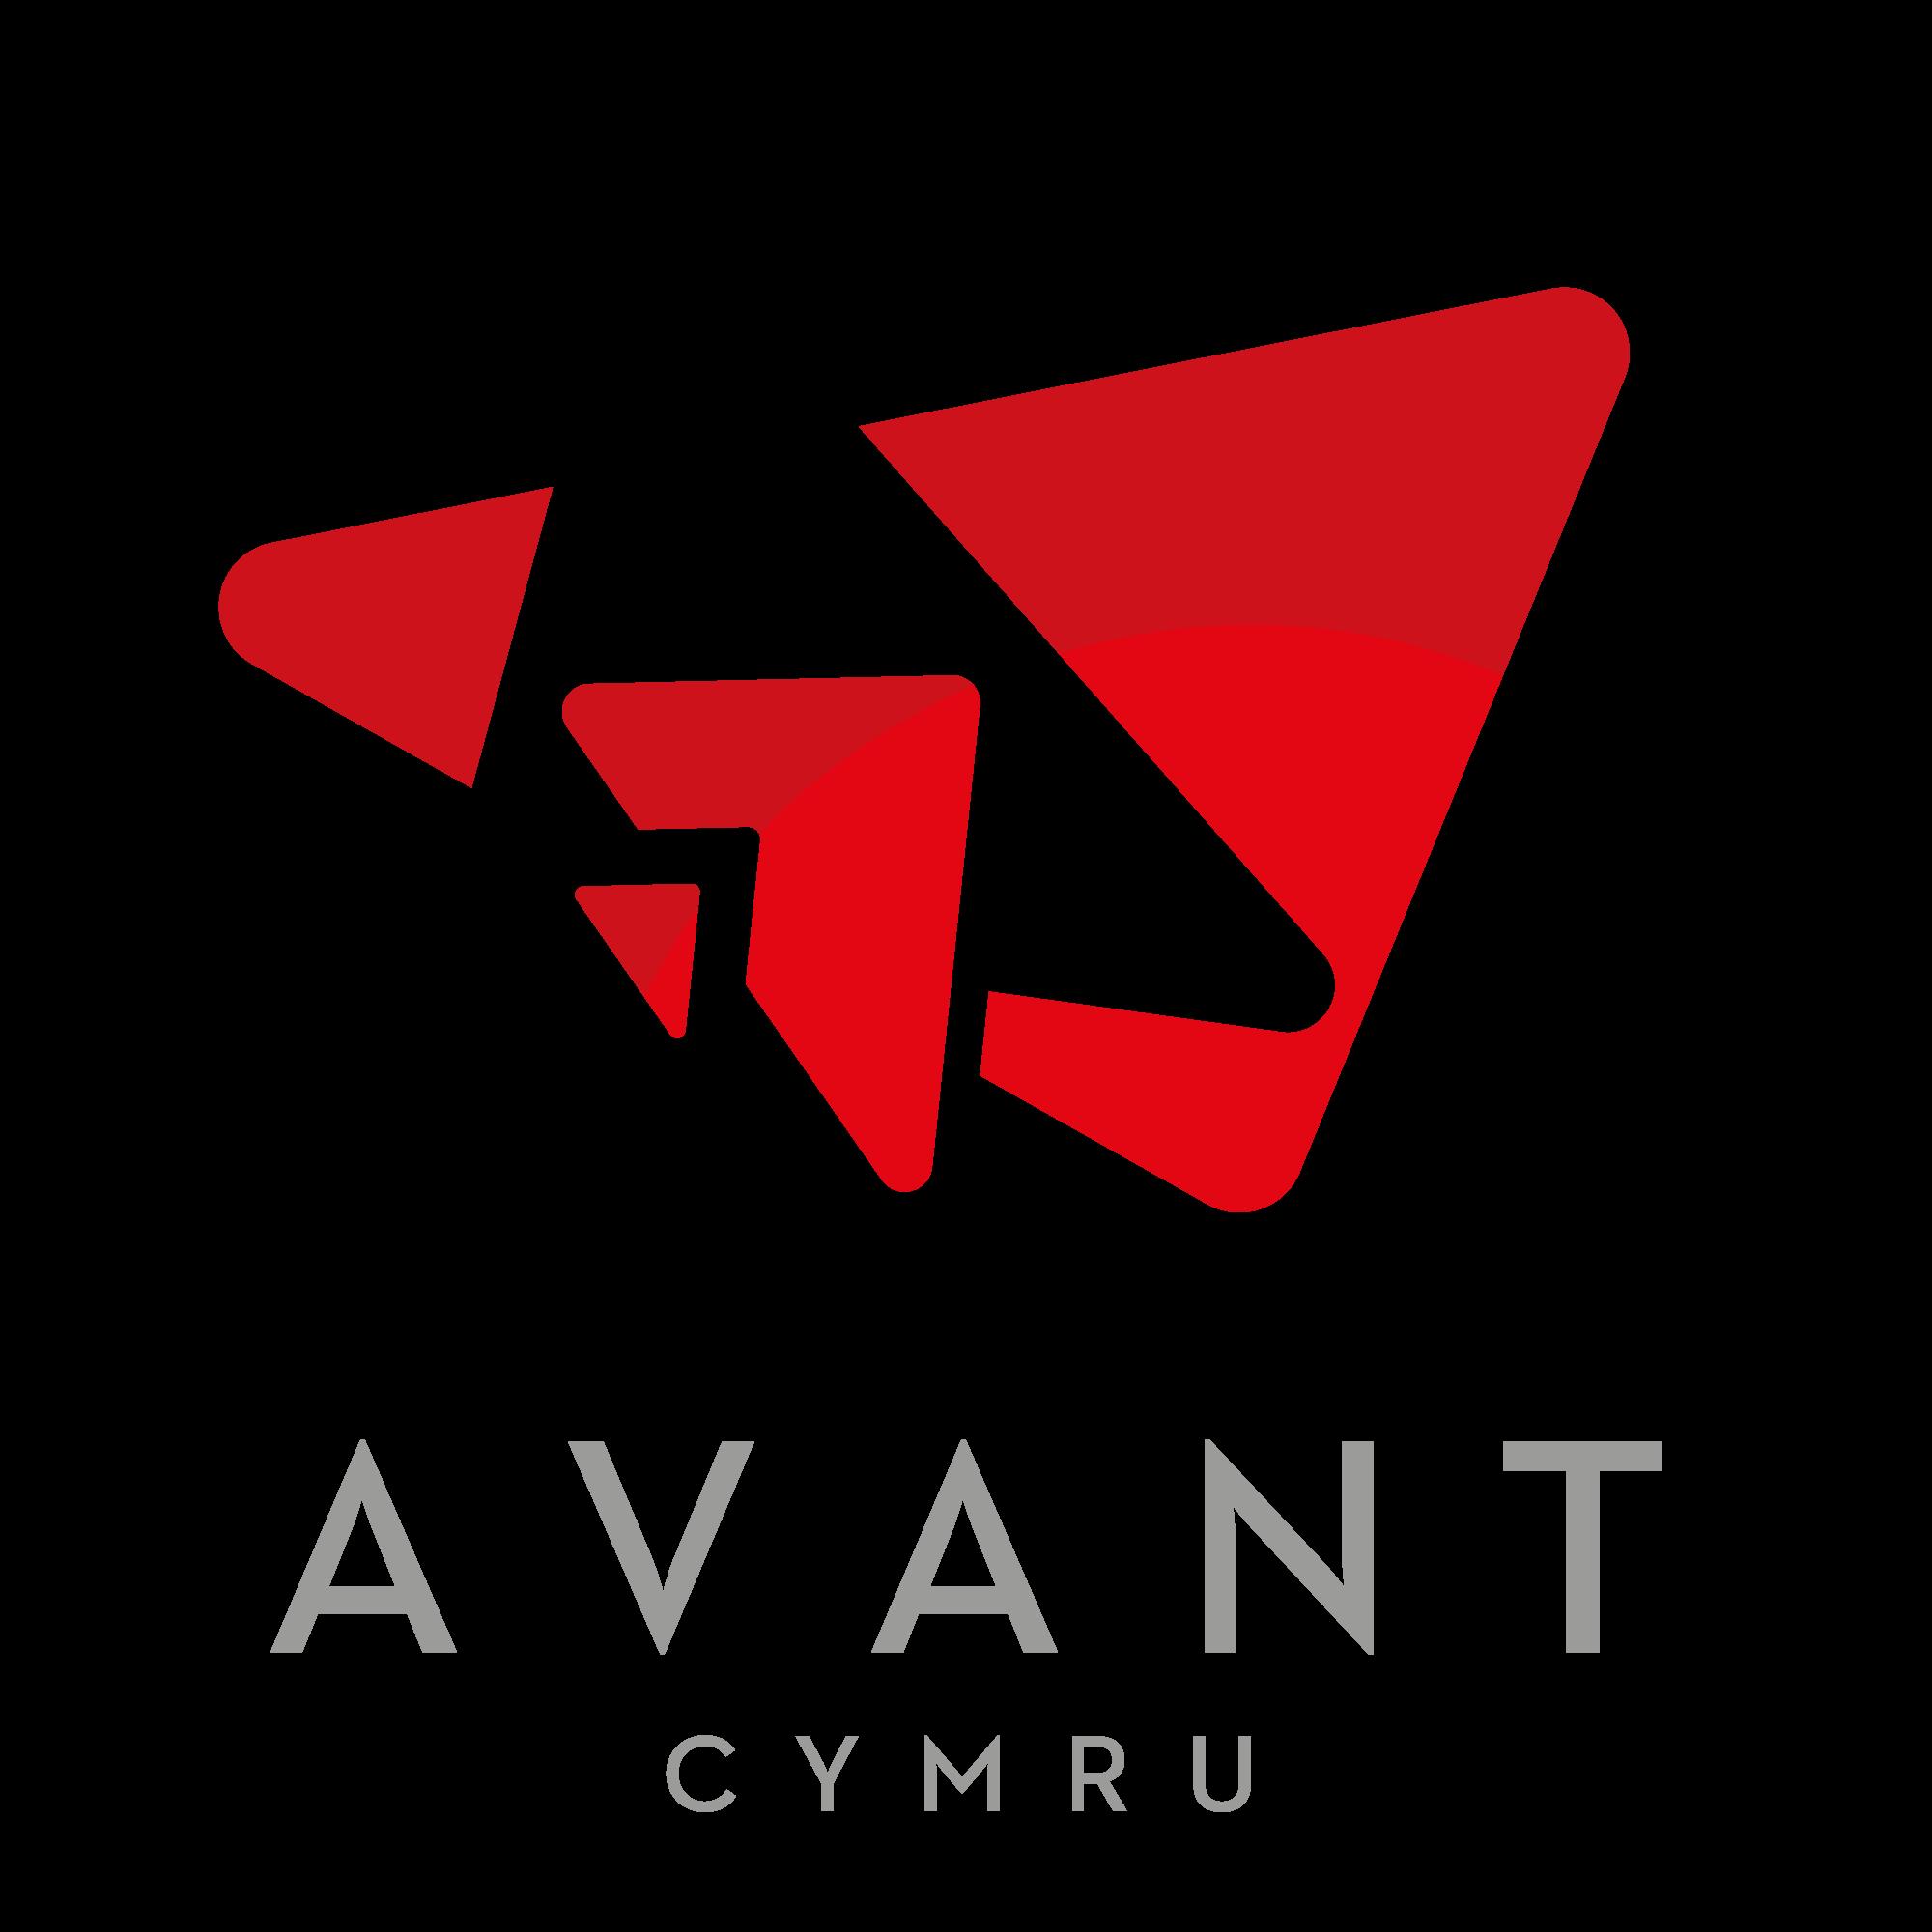 Avant Cymru